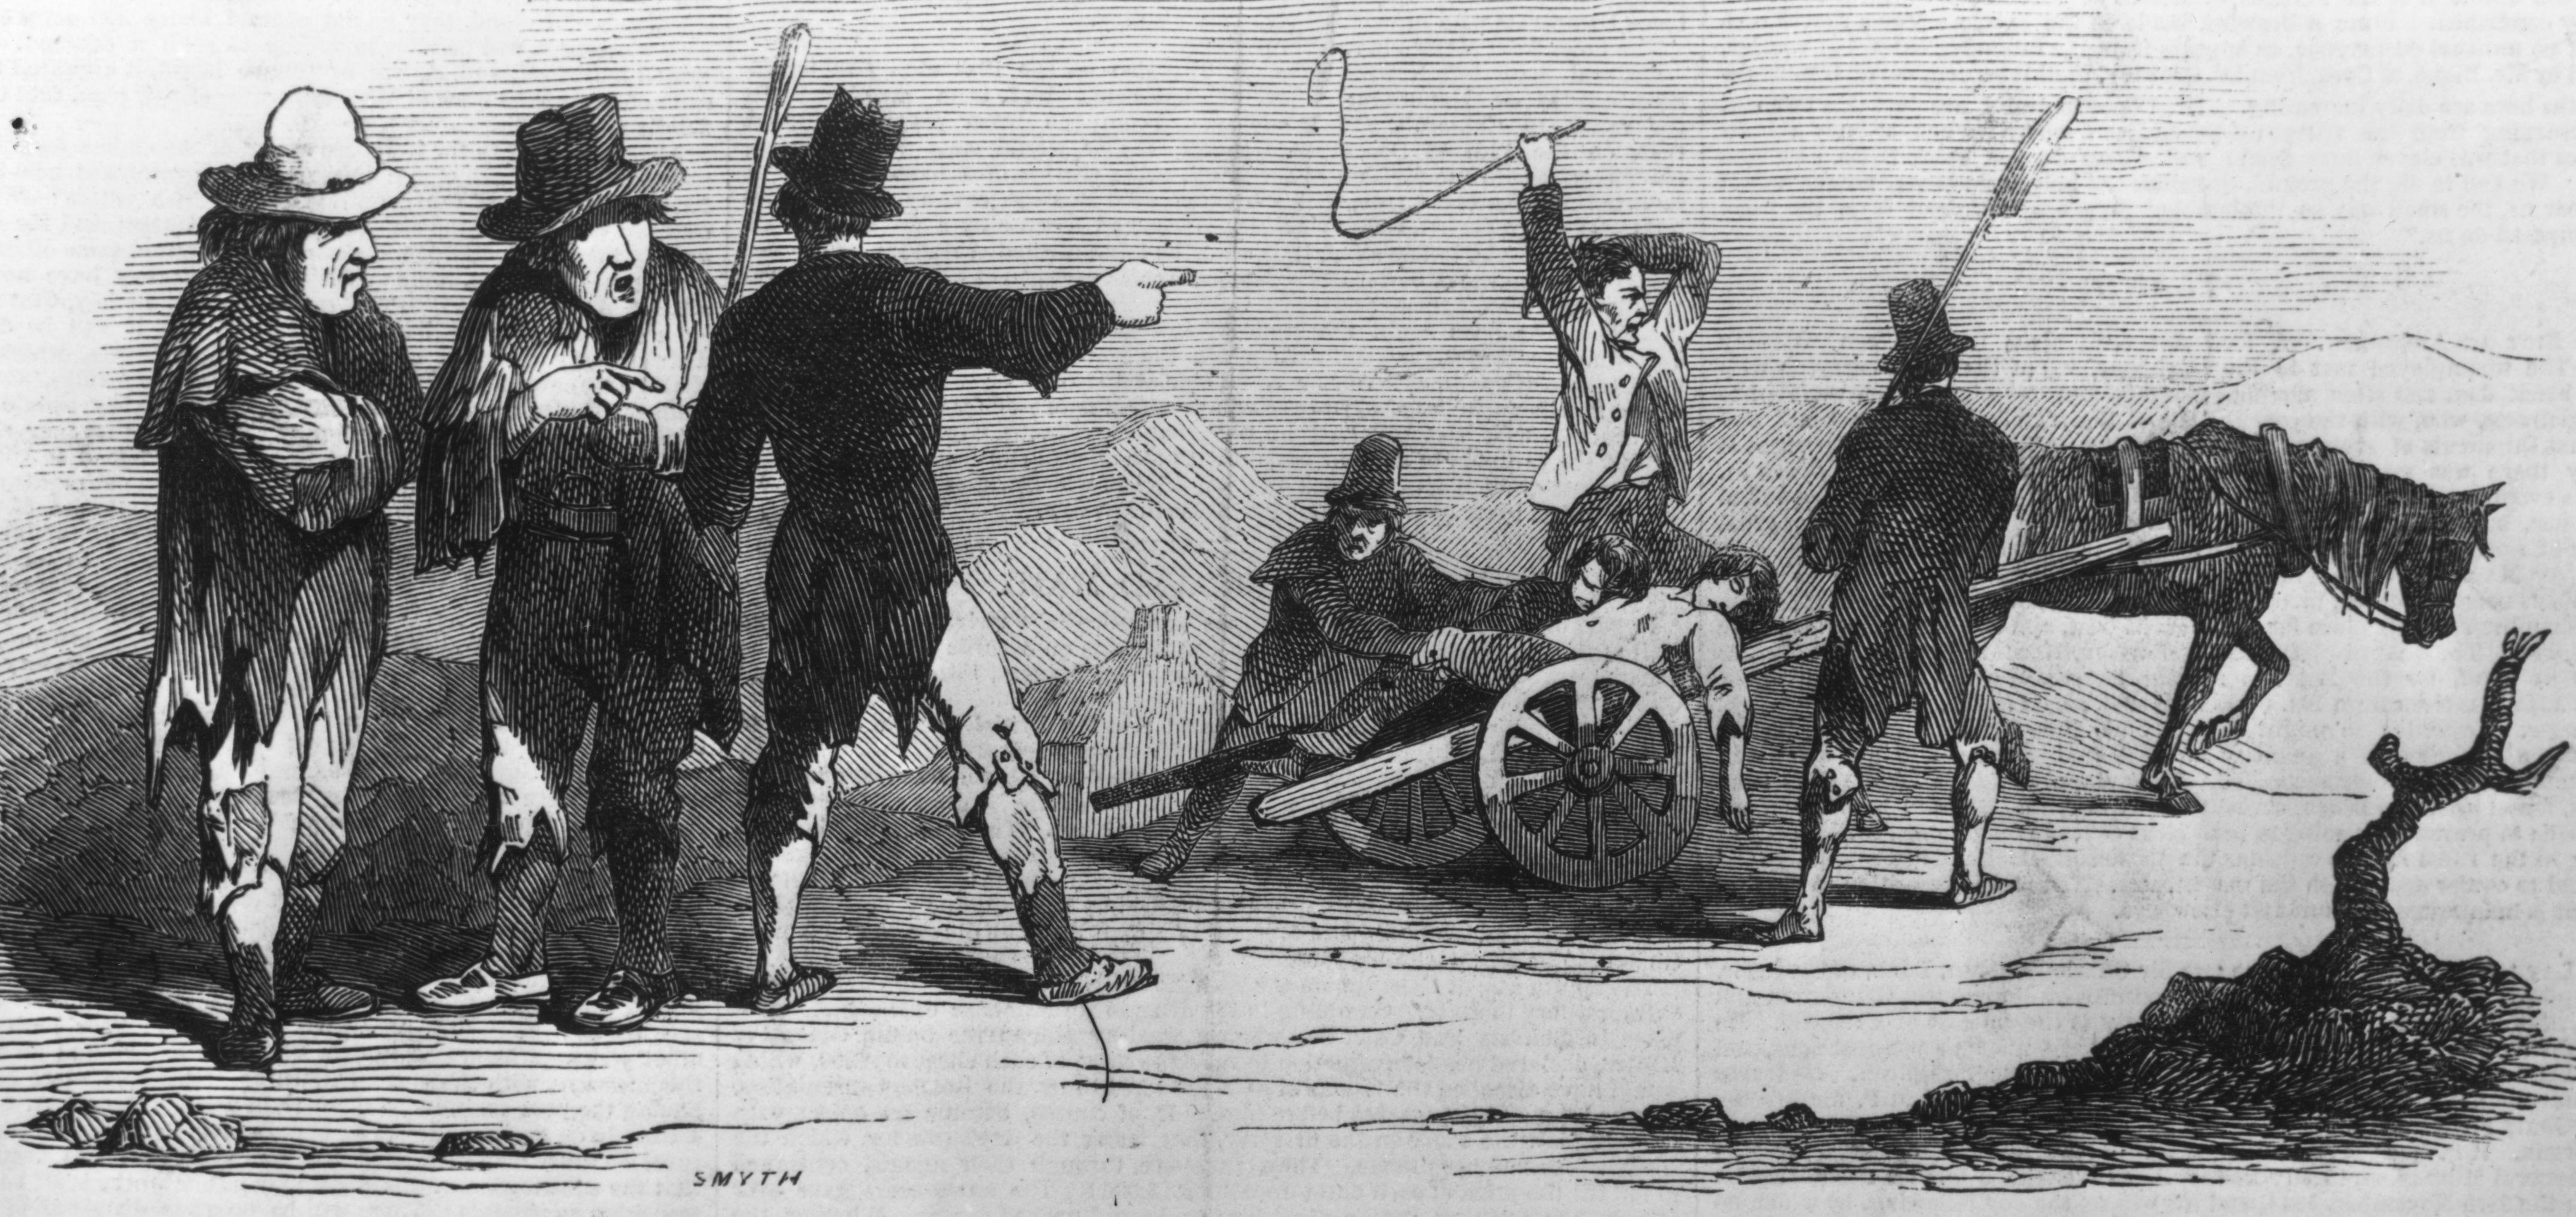 Potato Famine Ireland  When America Despised the Irish The 19th Century's